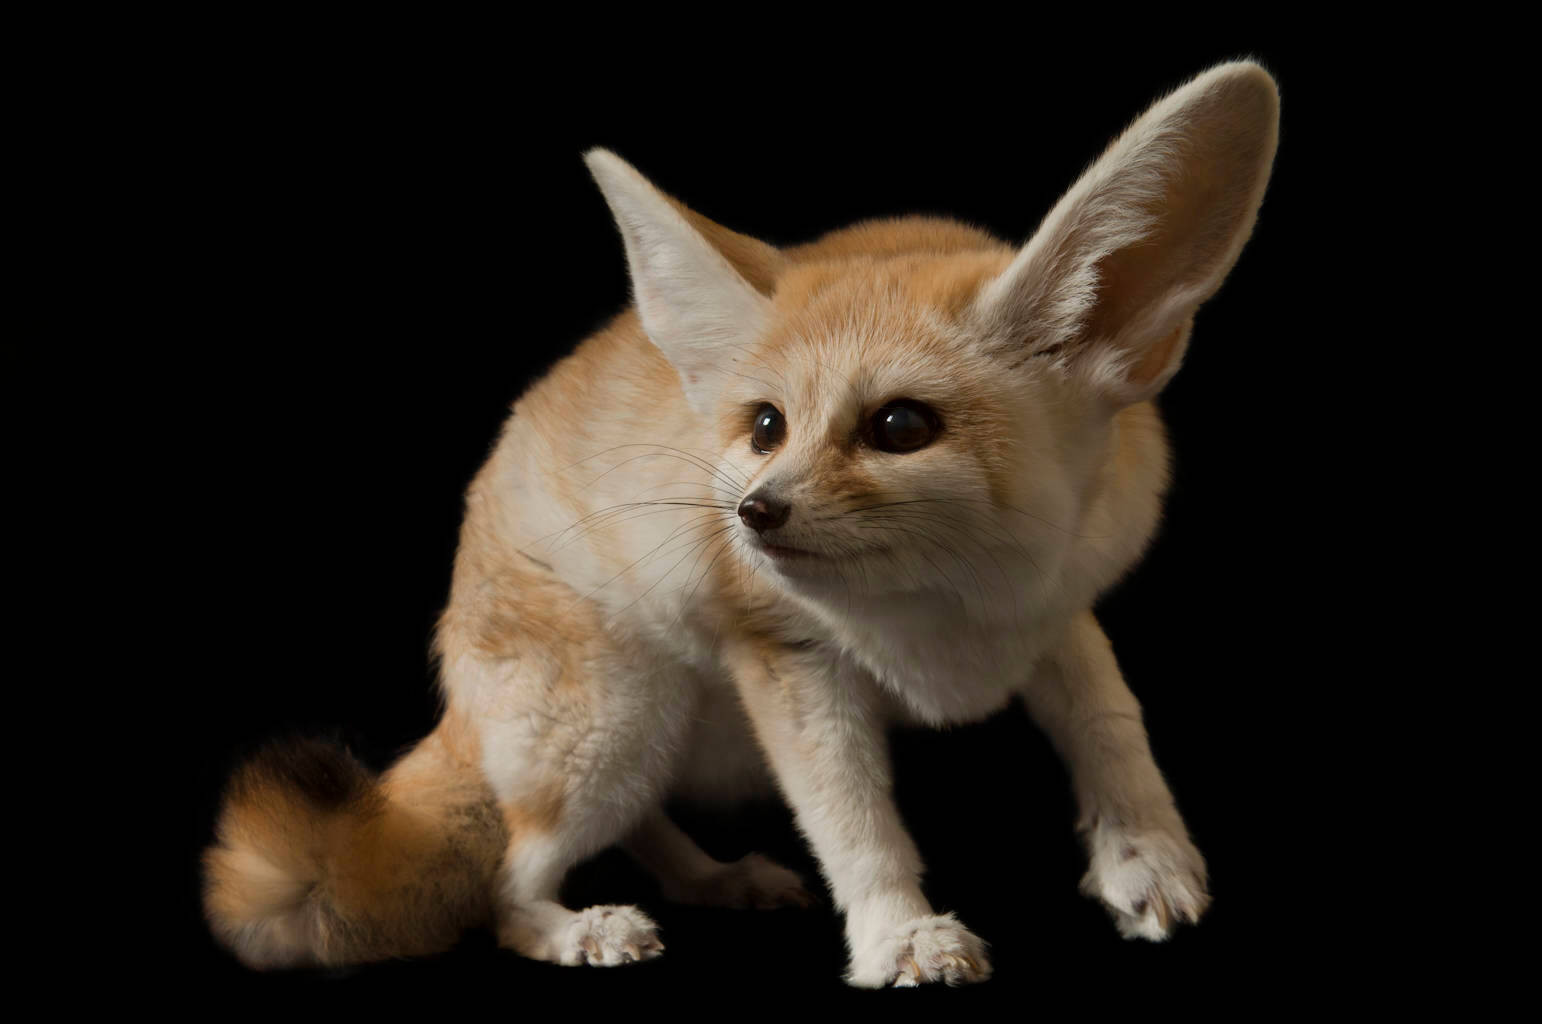 A fennec fox (Vulpes zerda) at the Denver Zoo, Denver, Colorado.